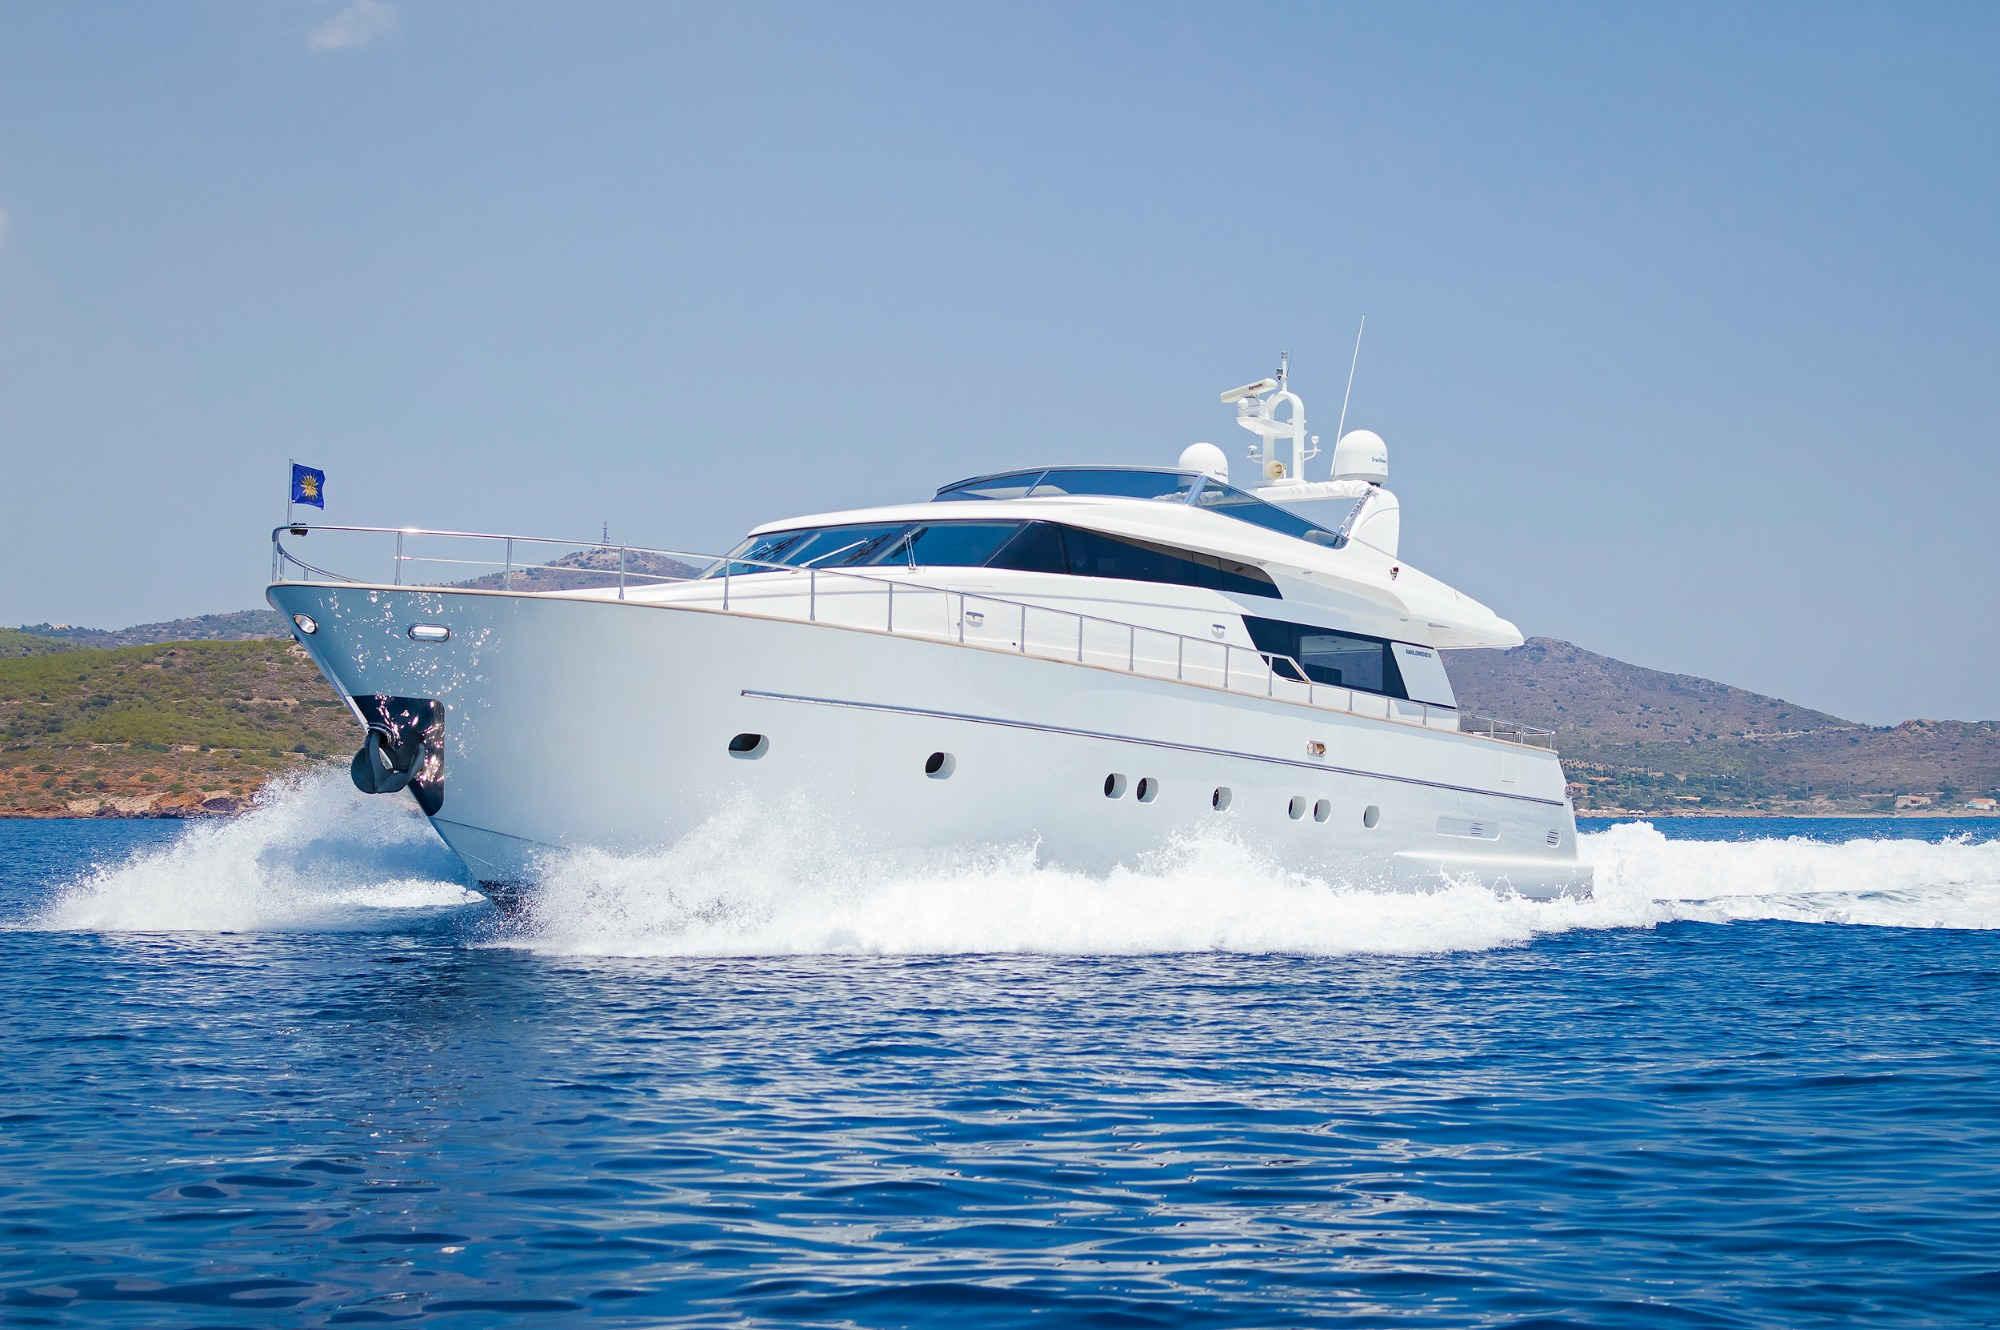 motor yacht charter in greece san lorenzo 72. Black Bedroom Furniture Sets. Home Design Ideas